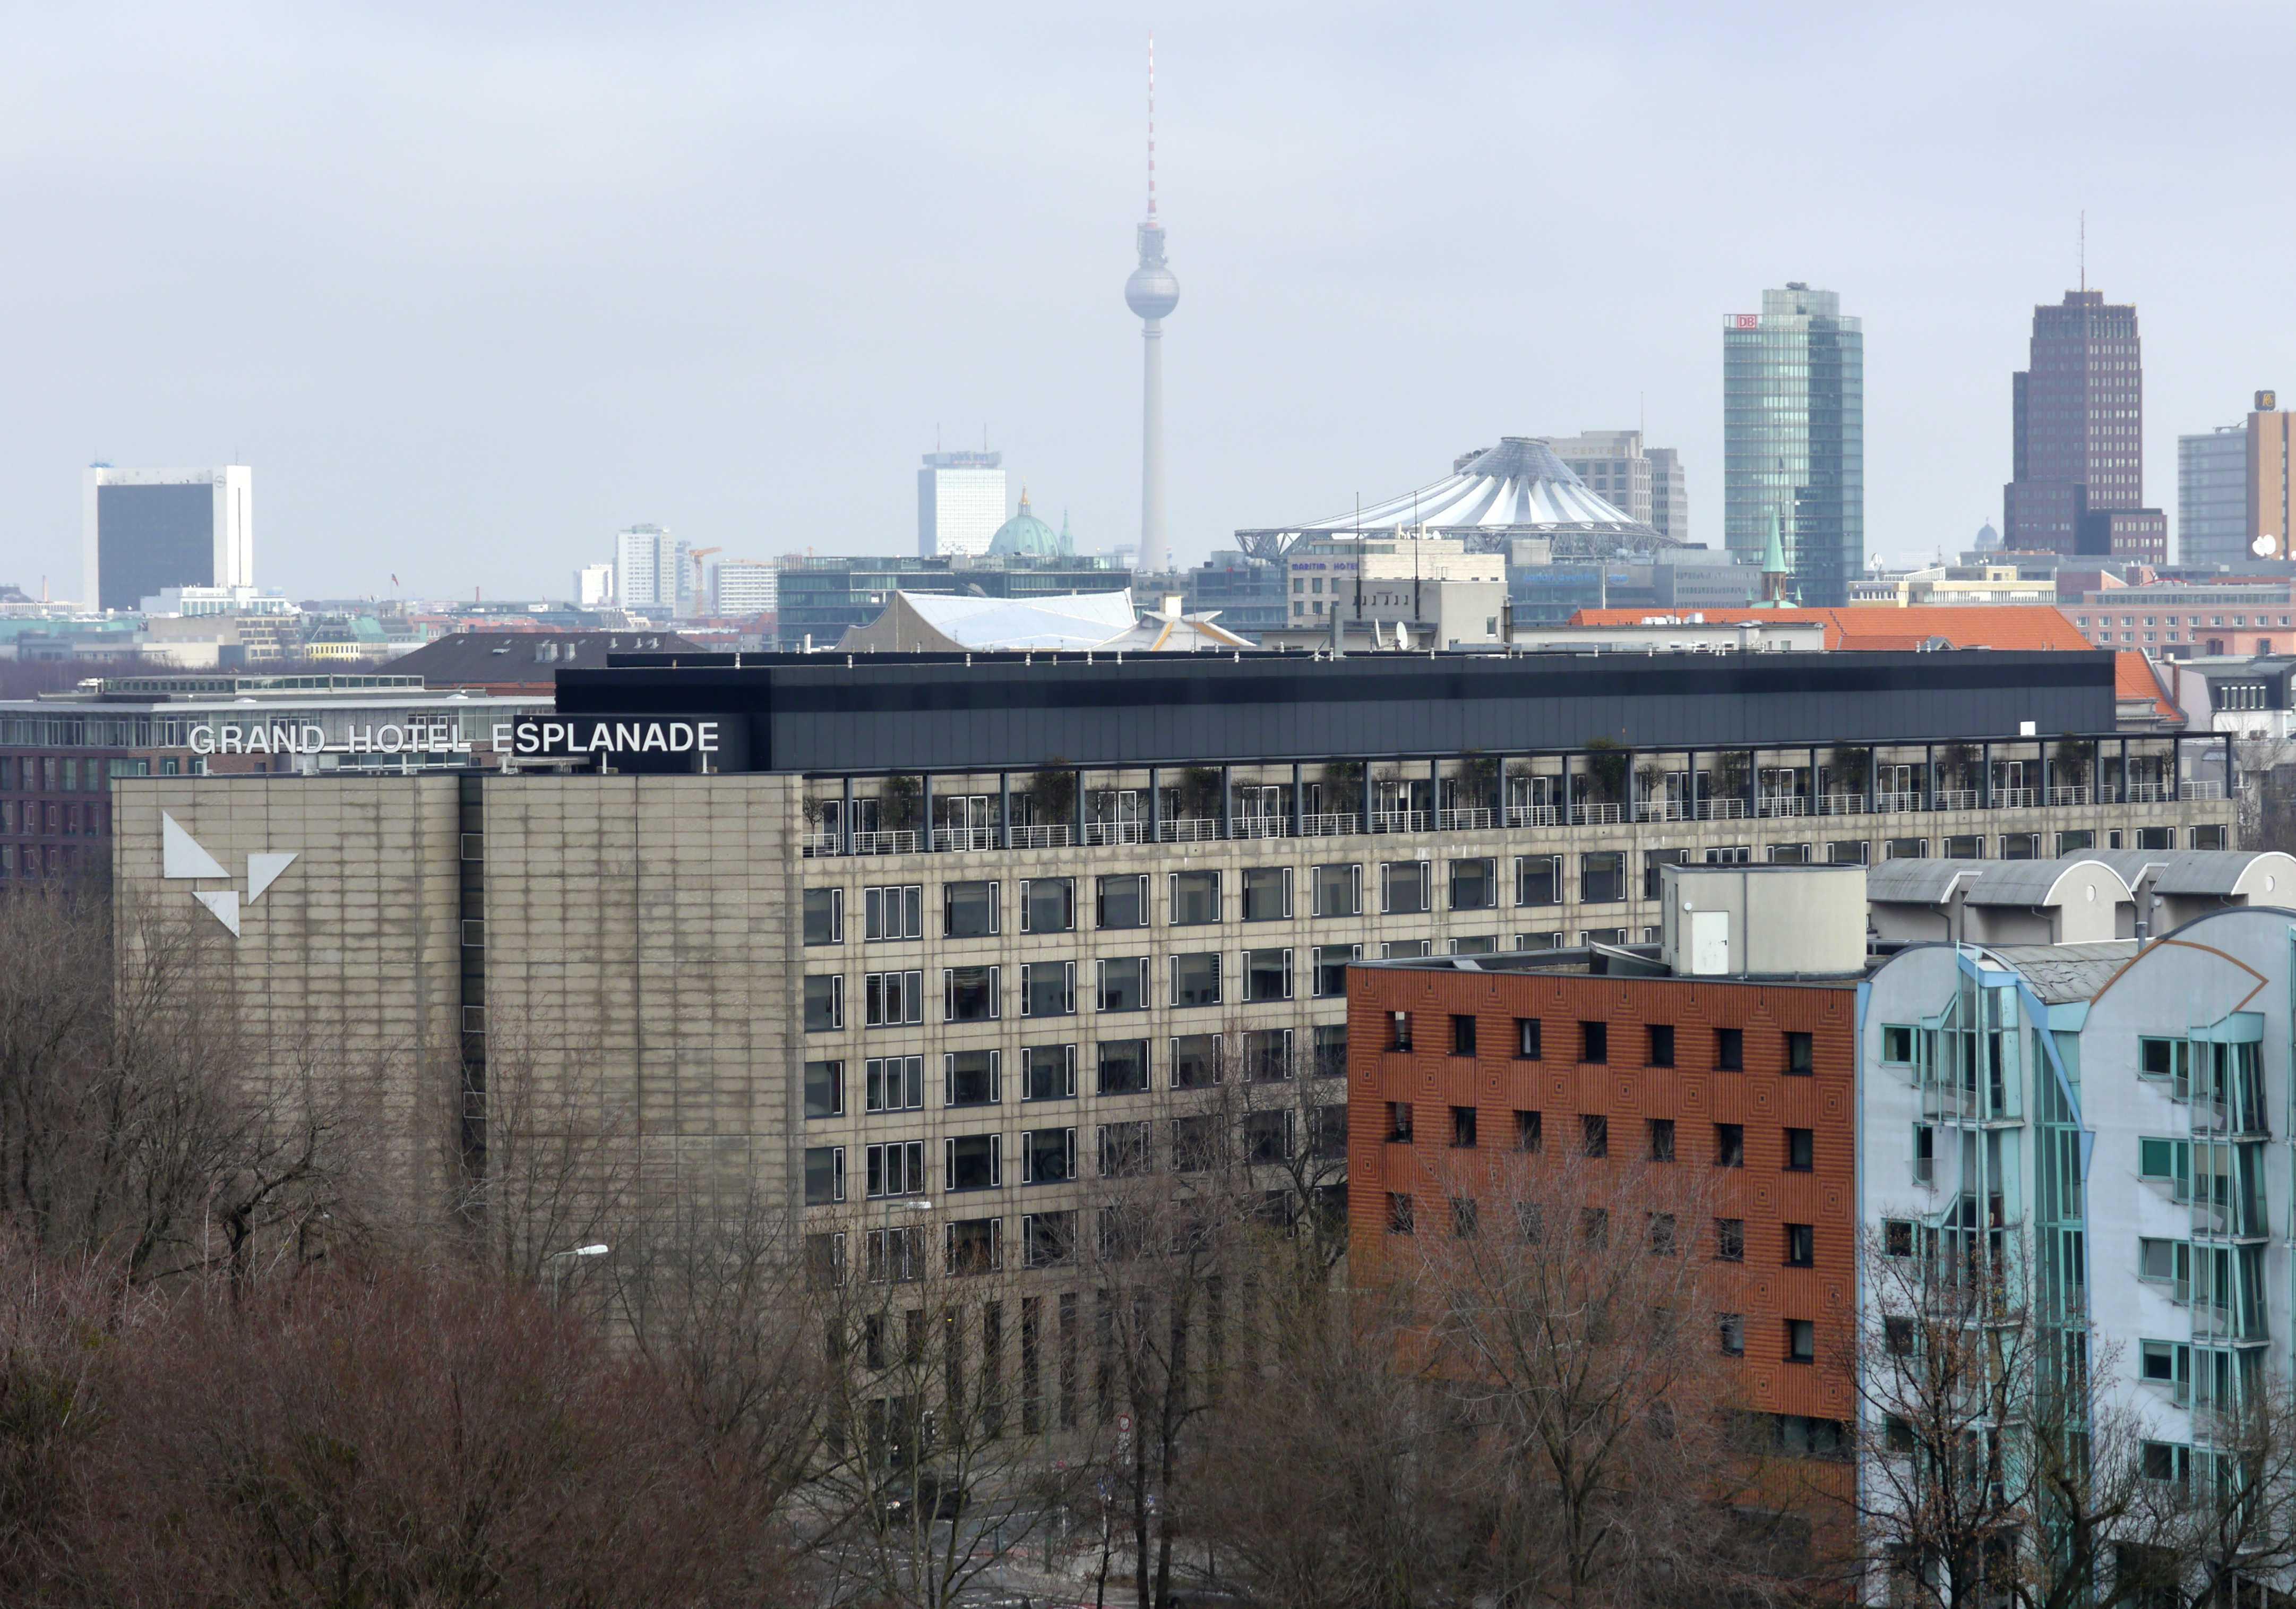 Sheraton Berlin Grand Hotel Esplanade Berlin